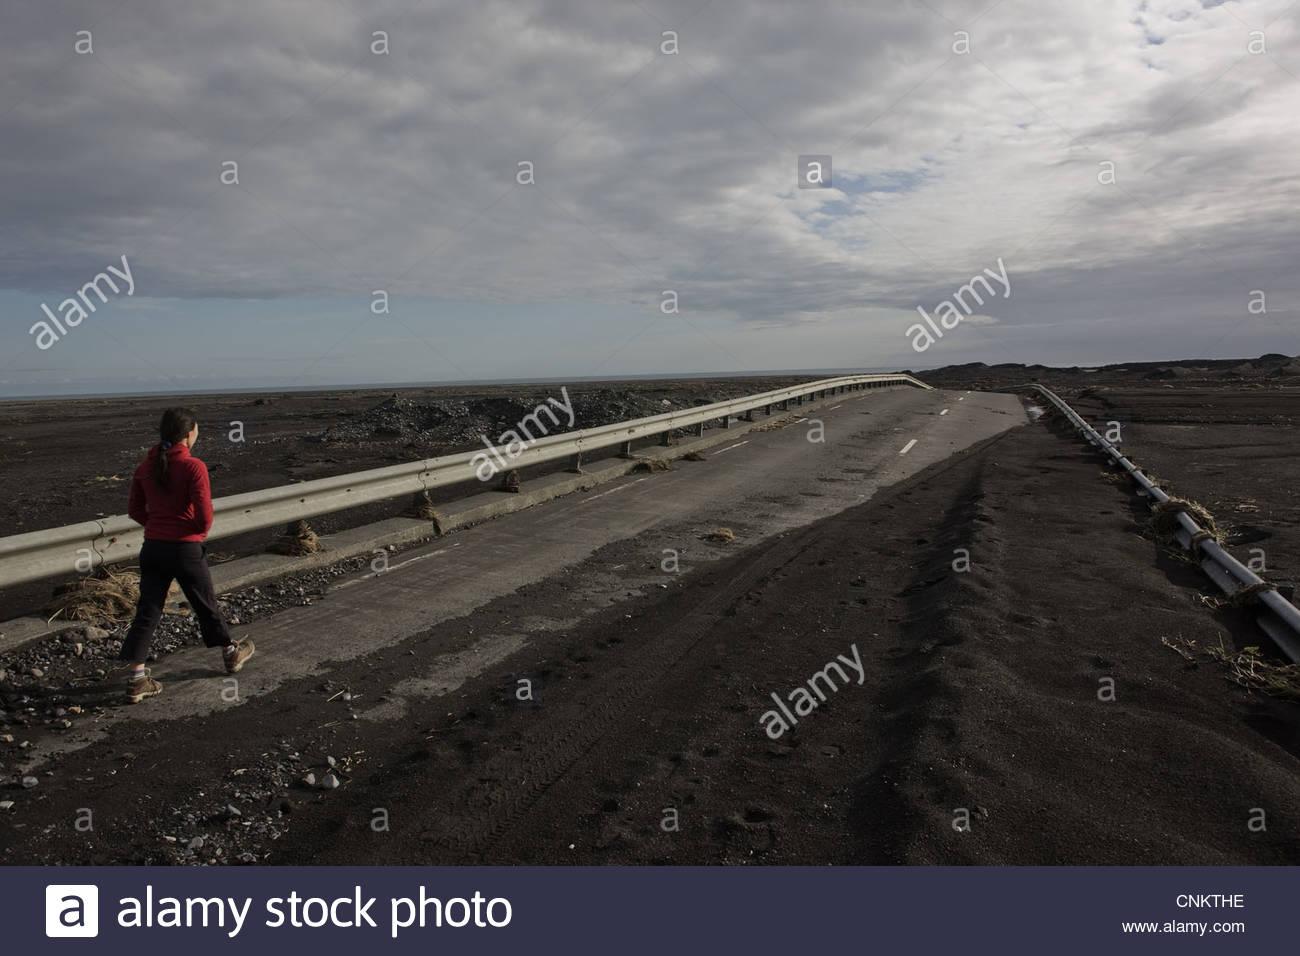 Woman walking on rural road - Stock Image